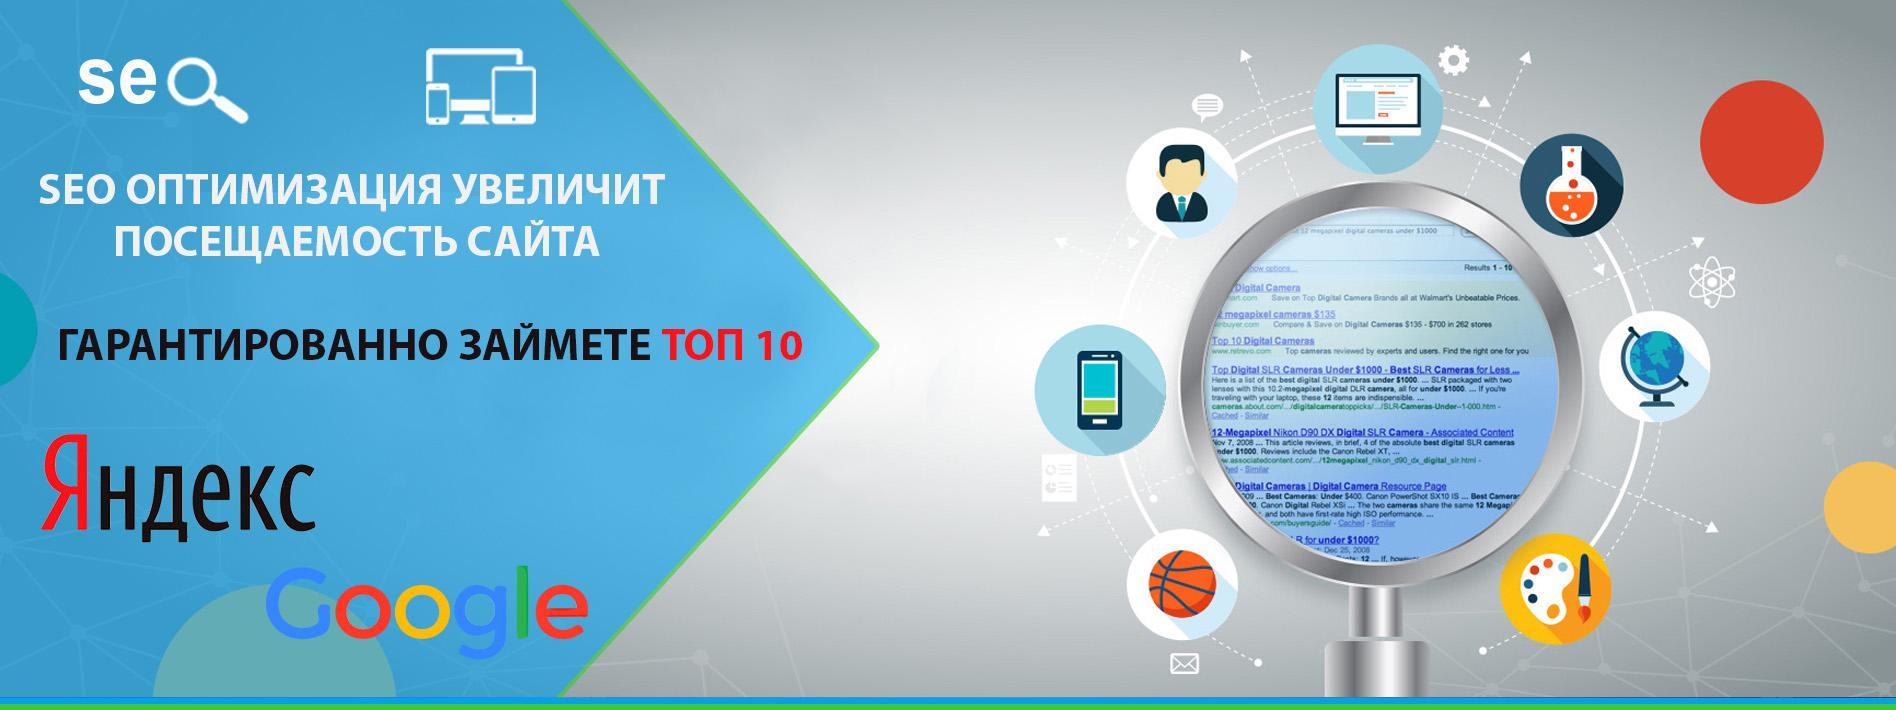 Оптимизация web сайта новосибирск ошибка при установке форума ipb на хостинг